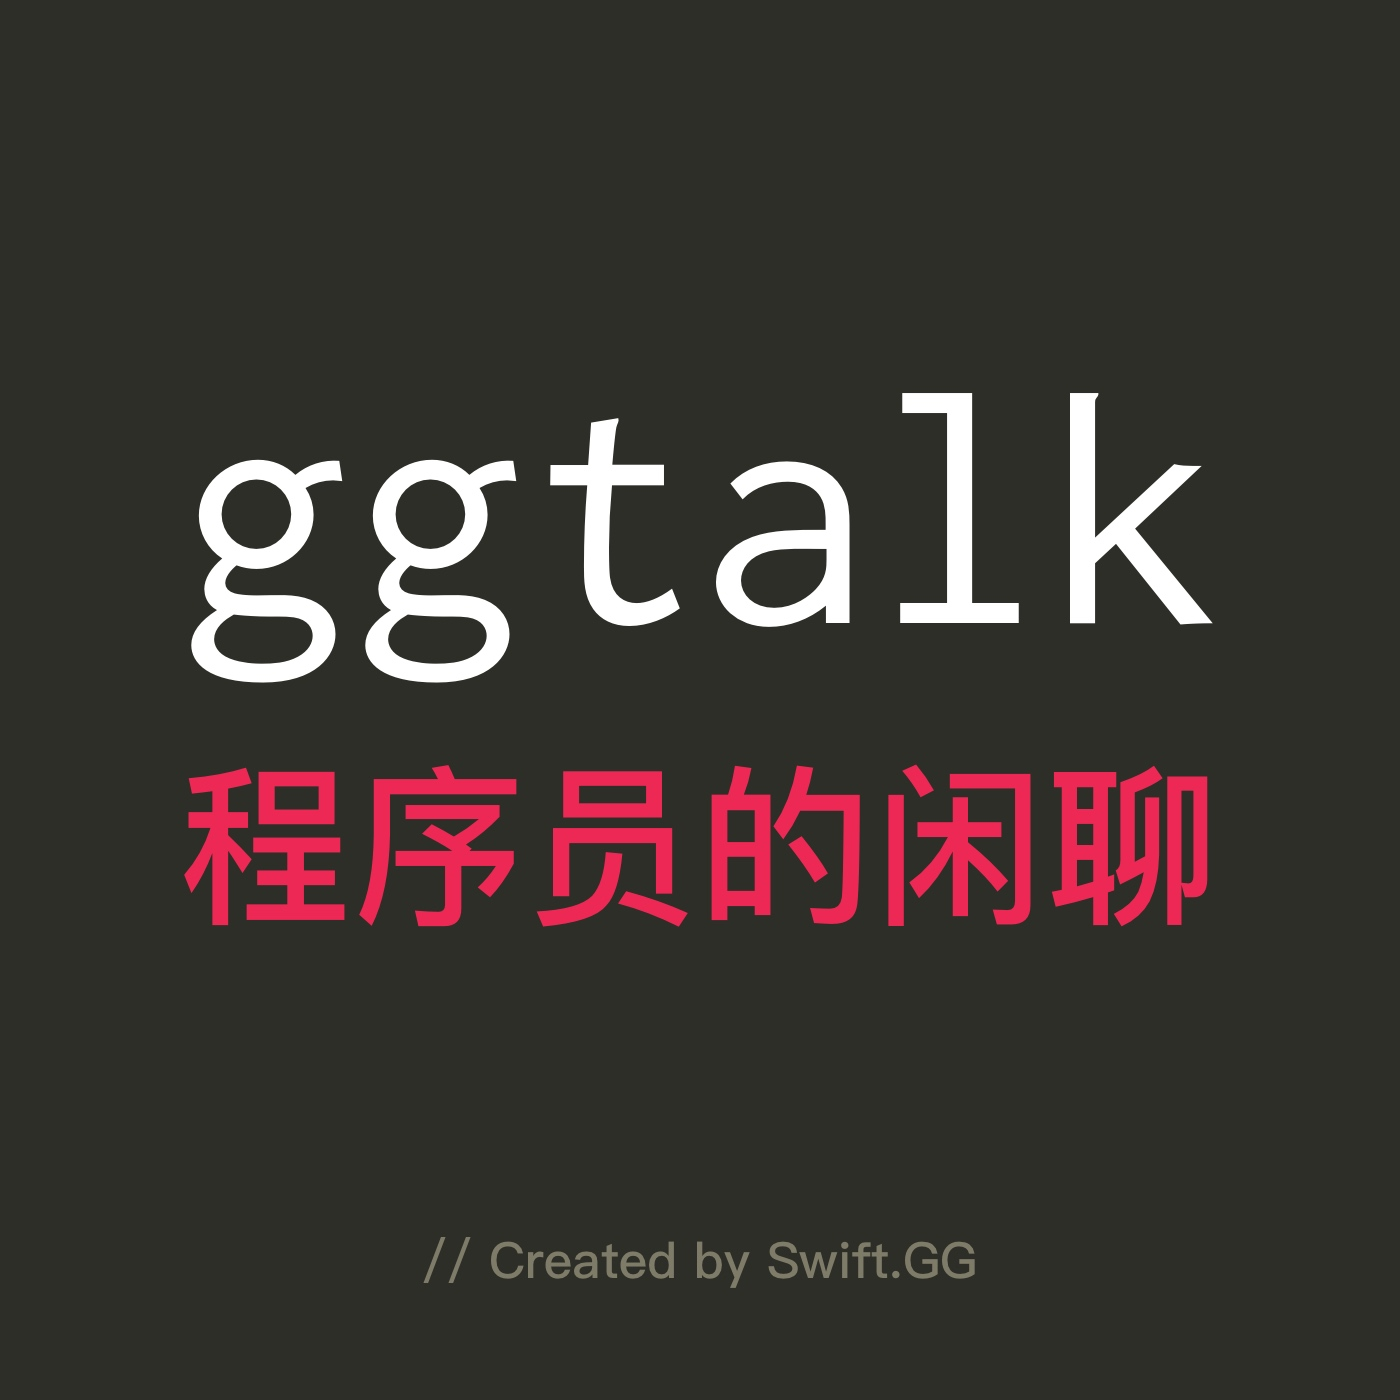 ggtalk Logo